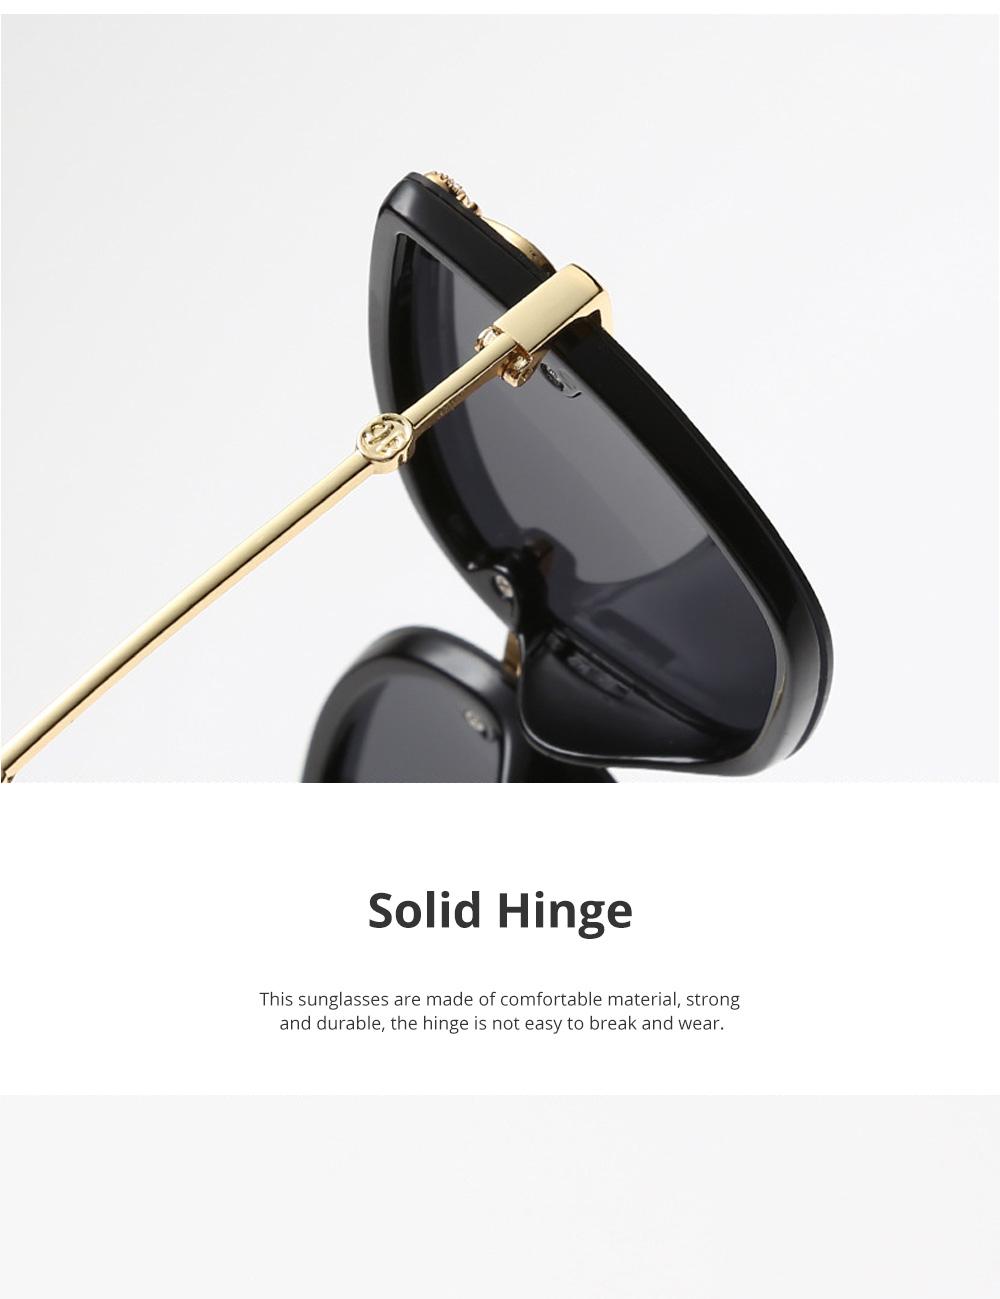 2020 New Fashionable Polarized Glasses Sunglasses for Women's Drivers Gradient Sunglasses 3